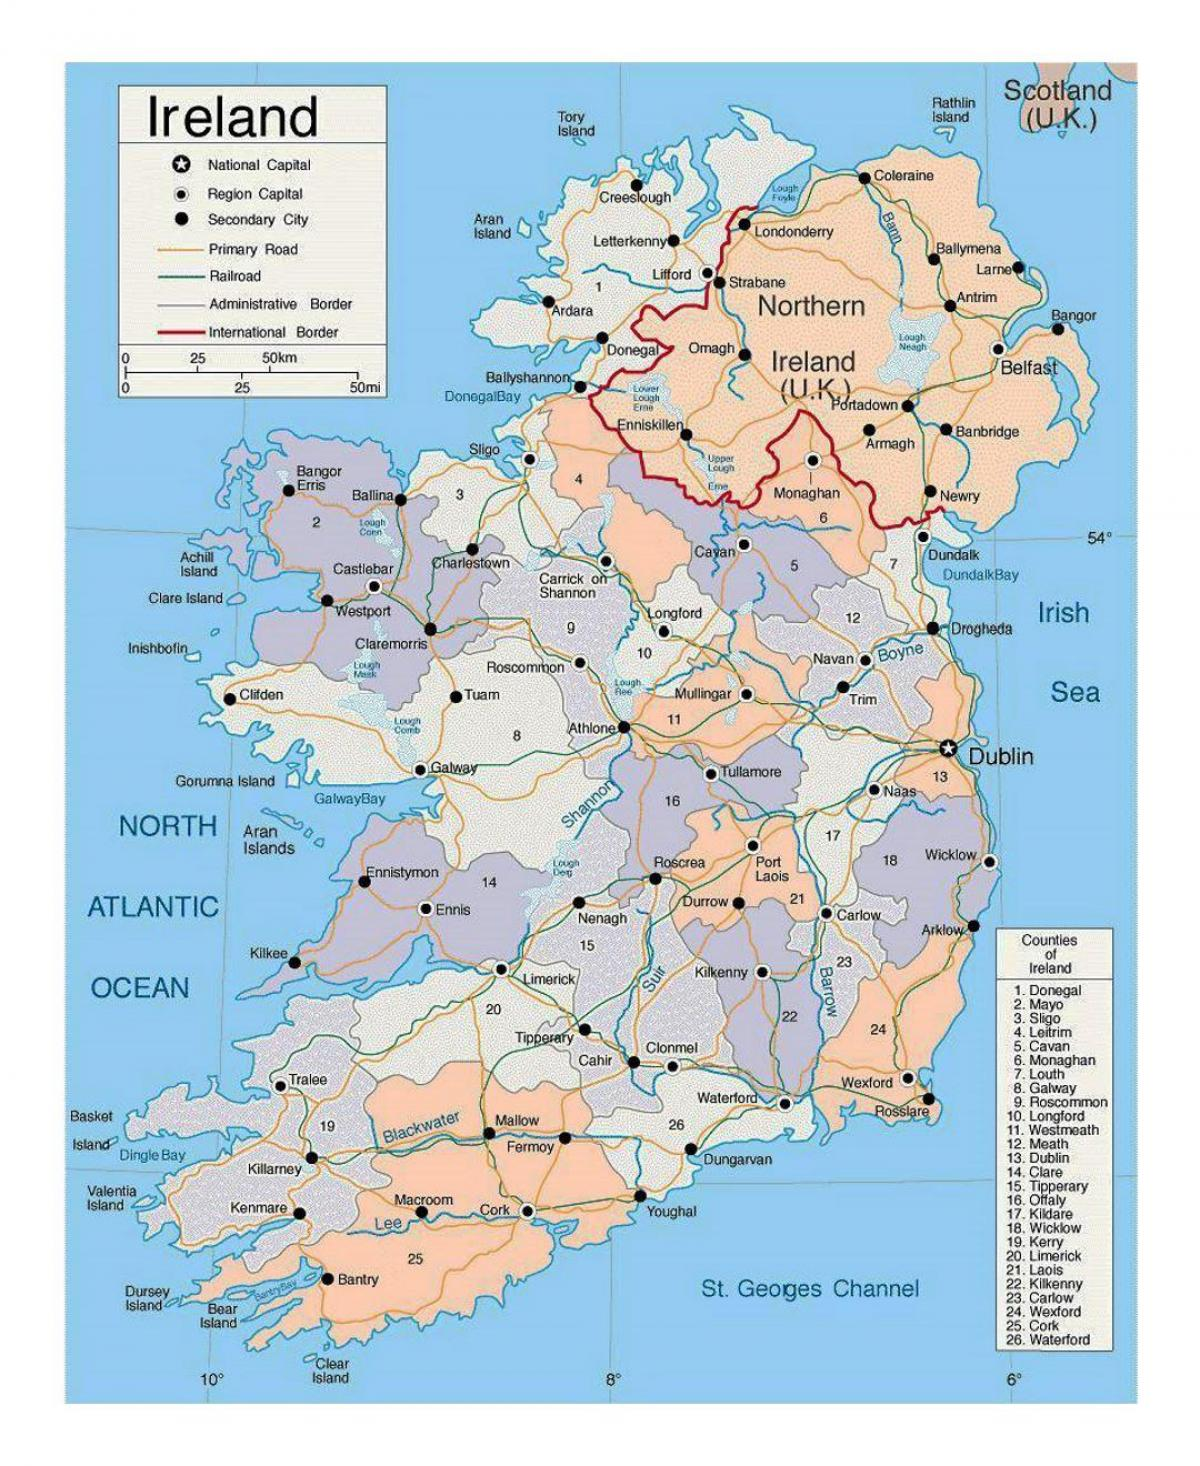 Irland Stader Karta Karta Over Irland Med Stader Norra Europa